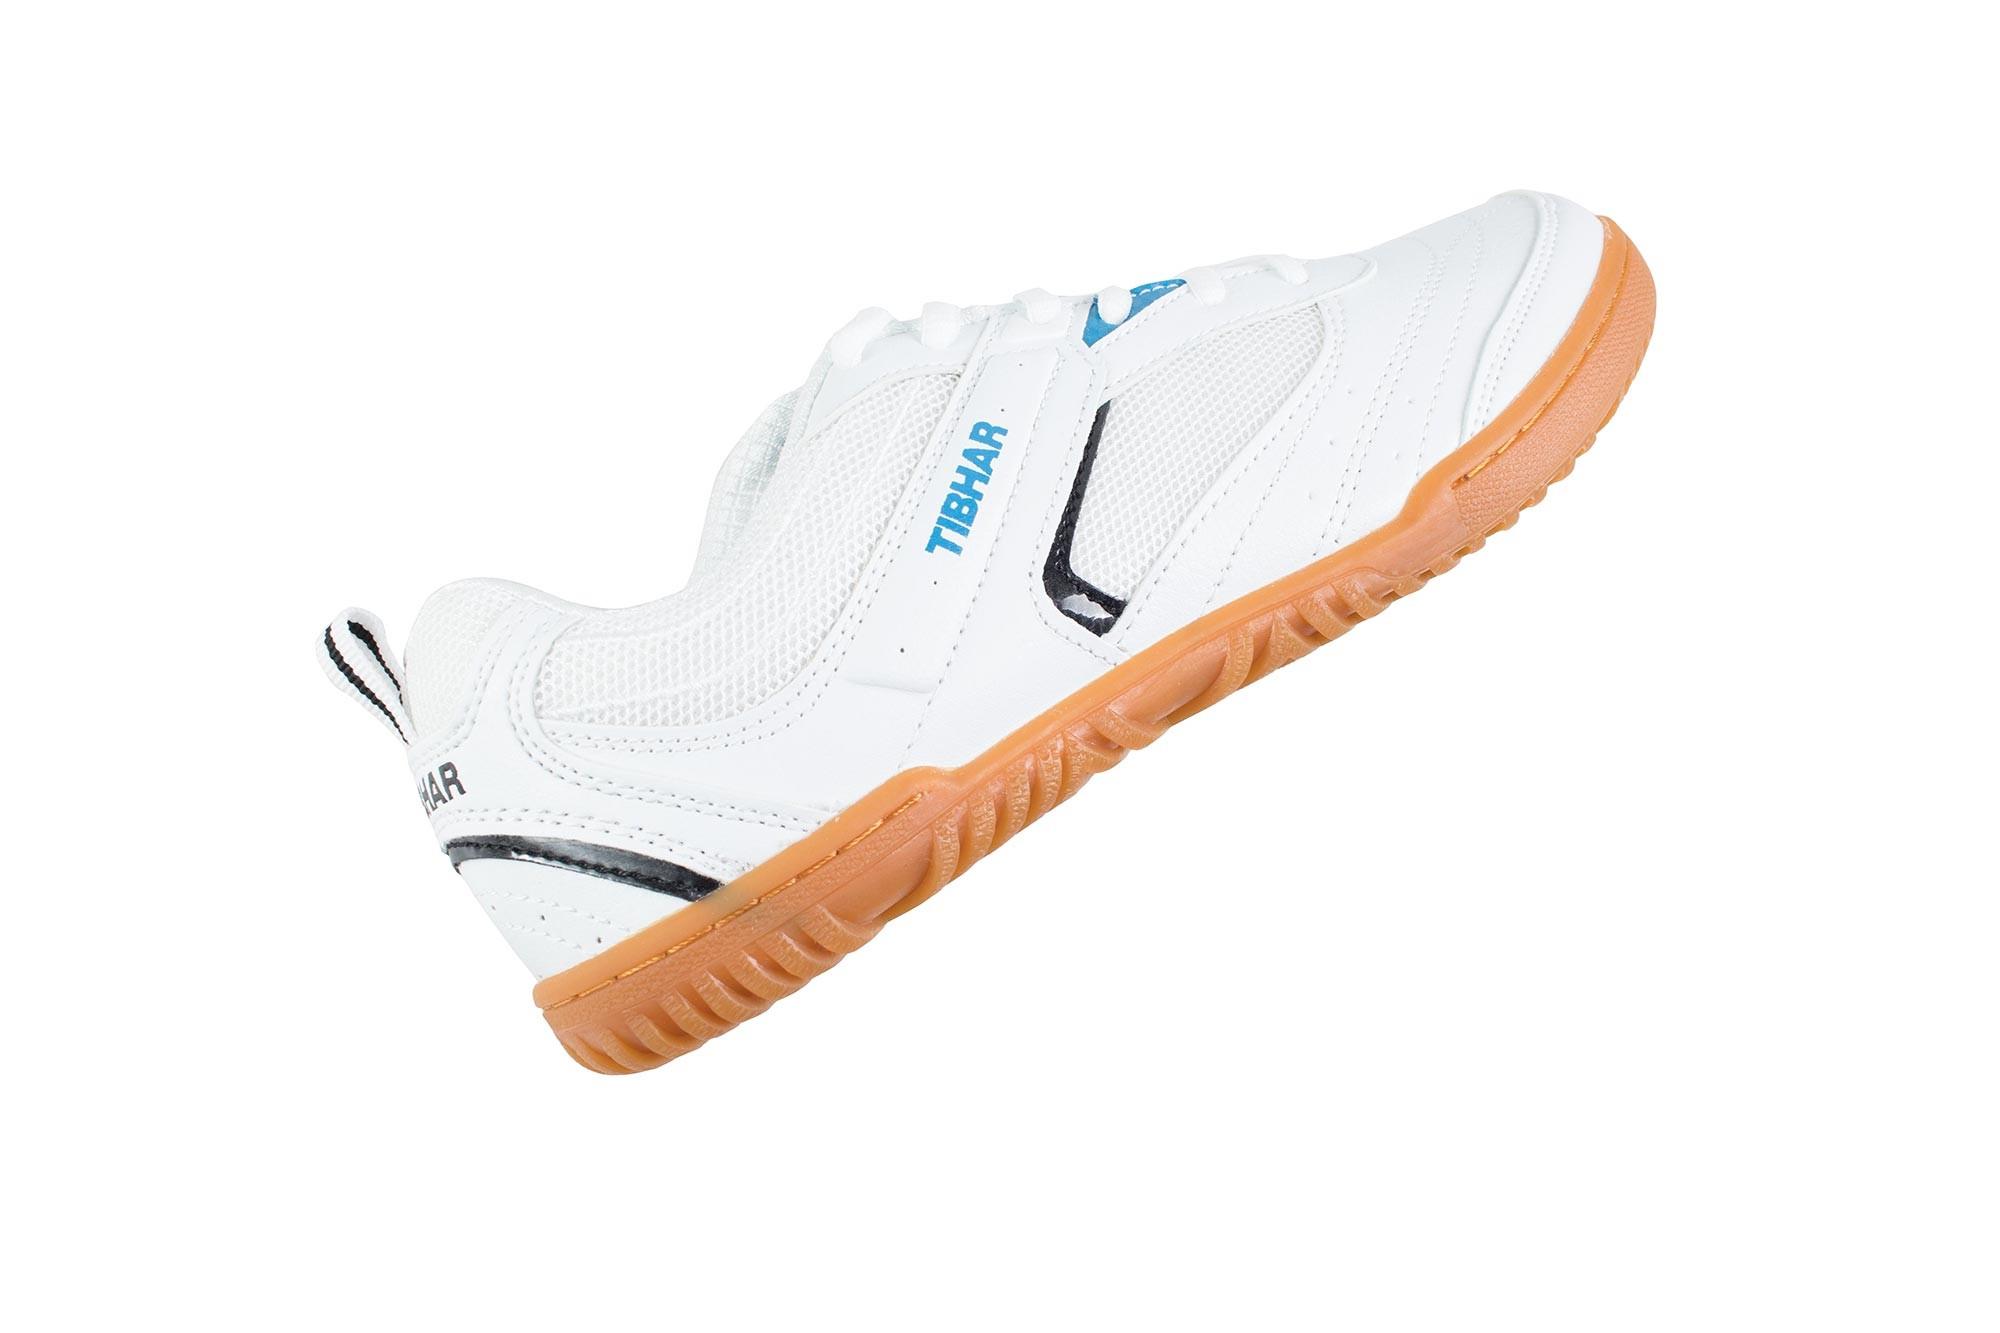 Tibhar Angebot des Monats Progress Soft TT Schuh